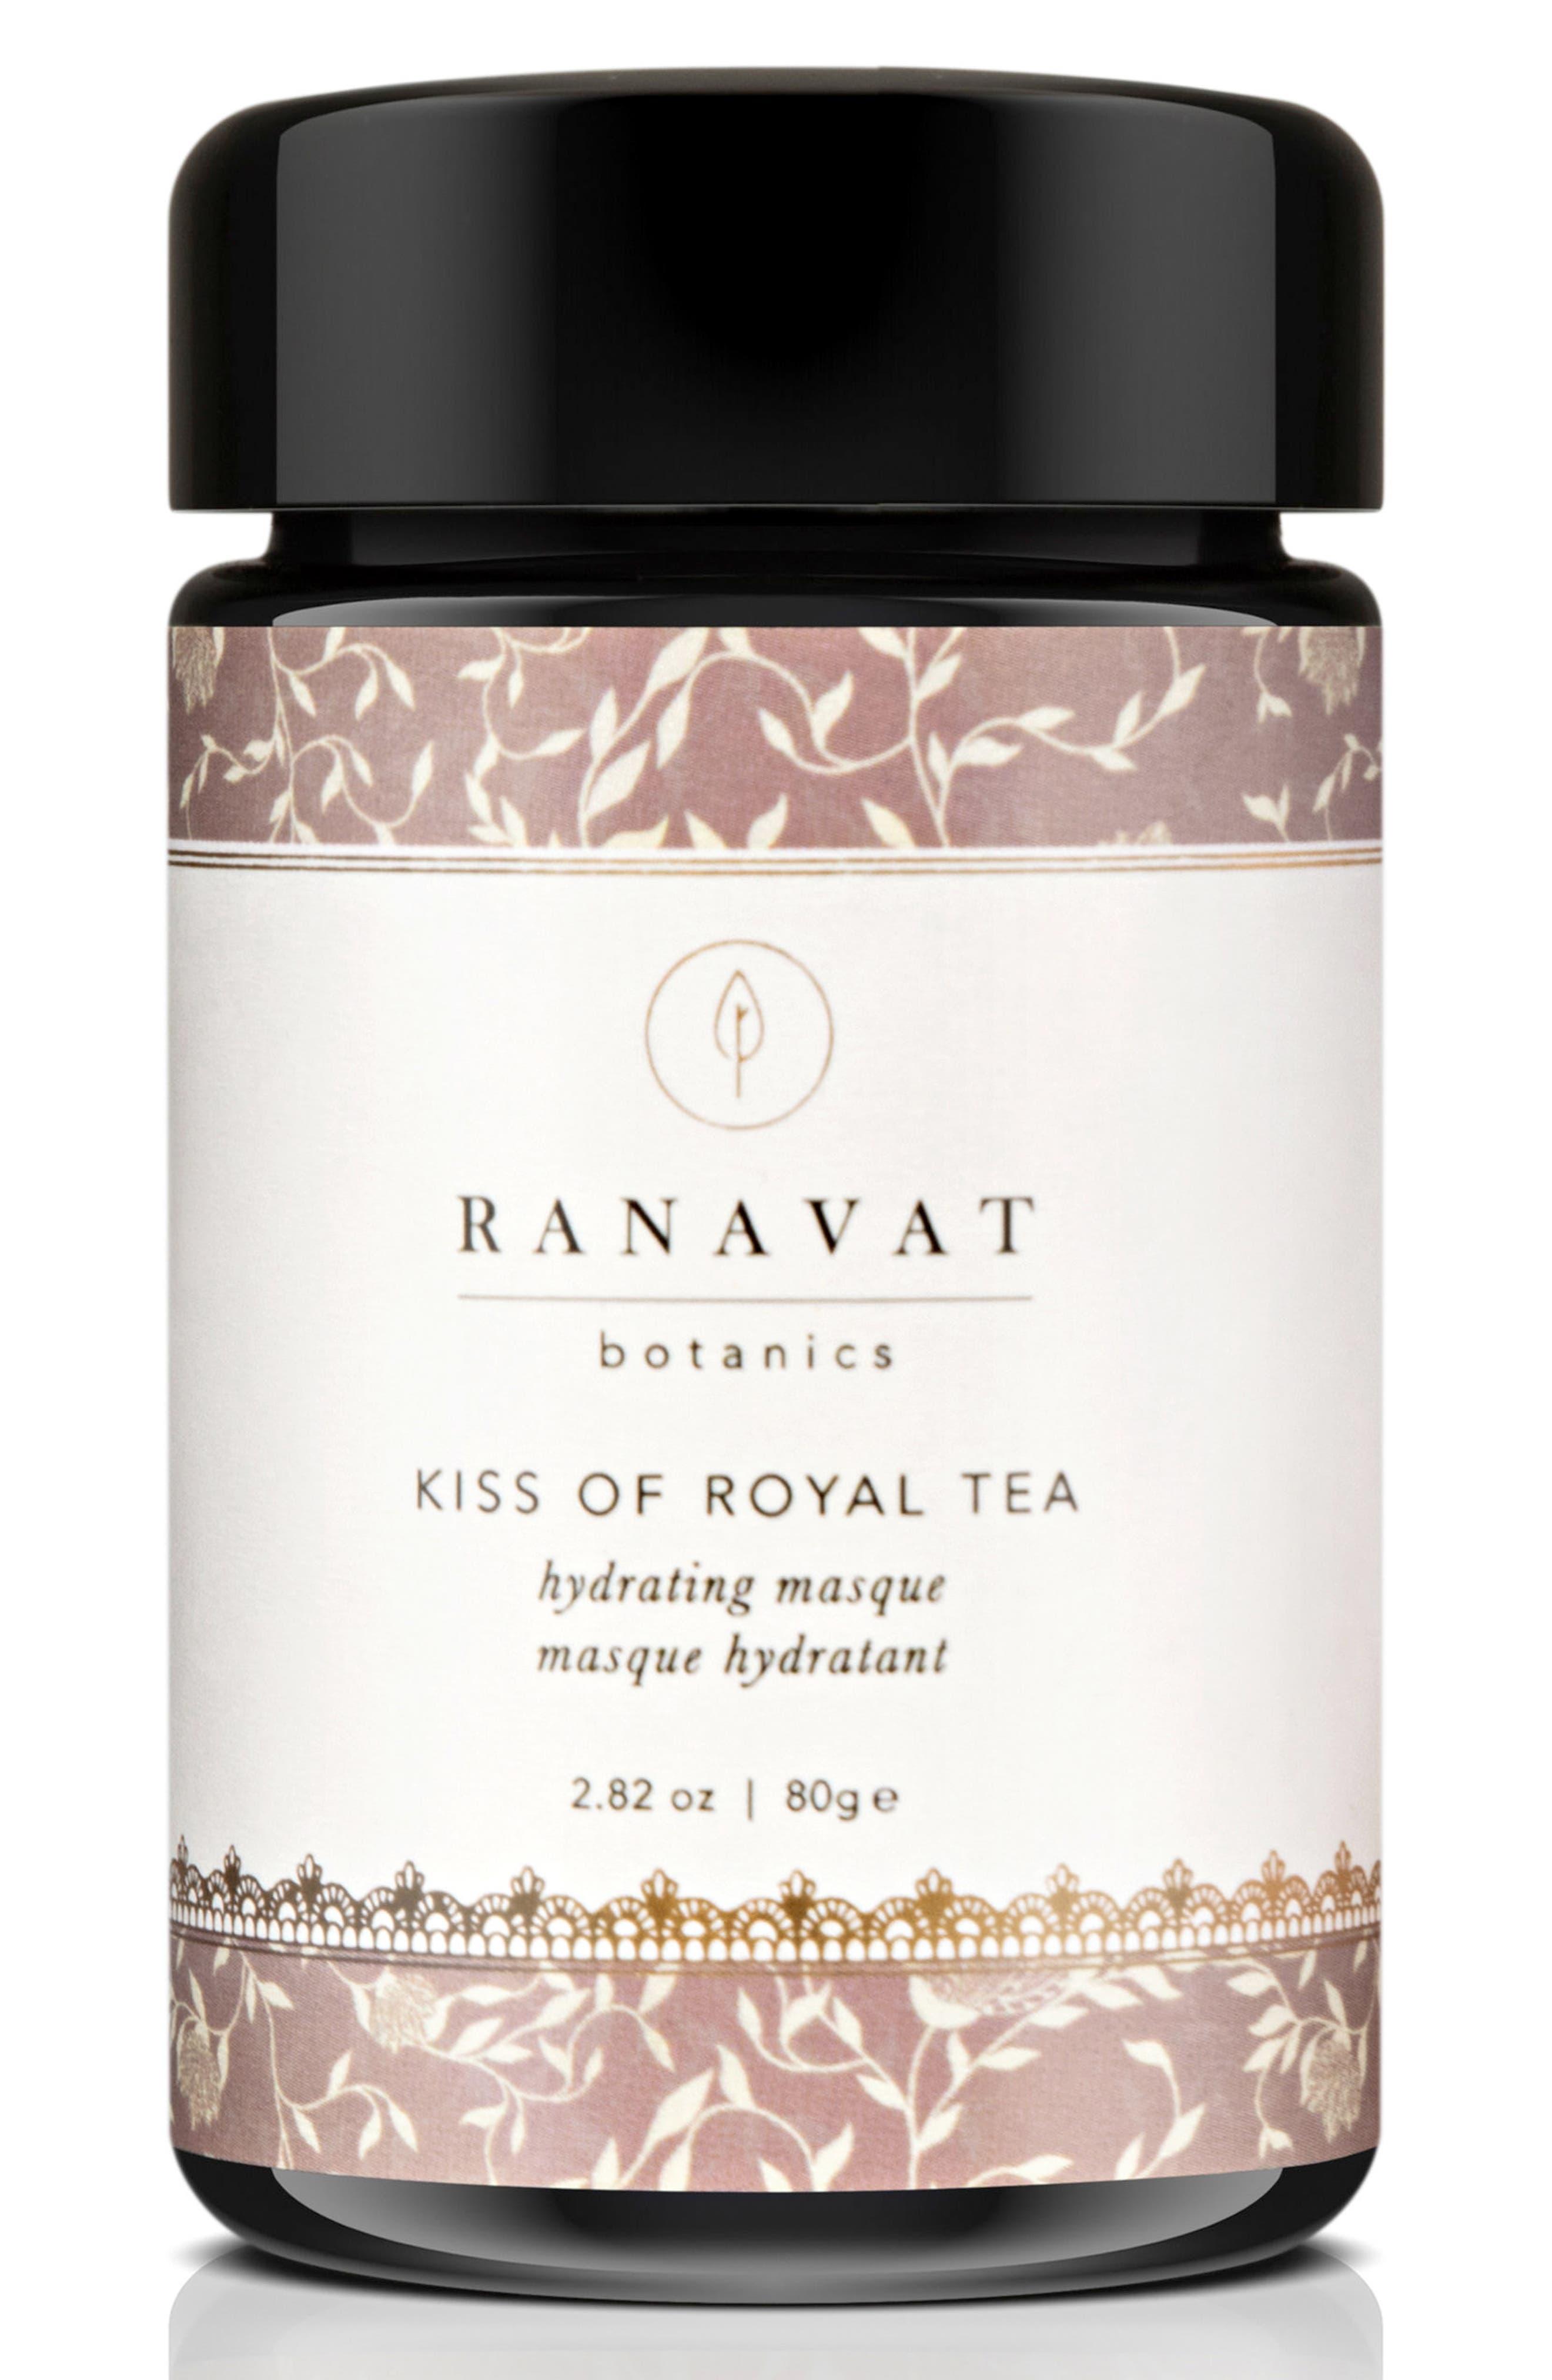 Ranavat Botanics Kiss of Royal Tea Hydrating Masque